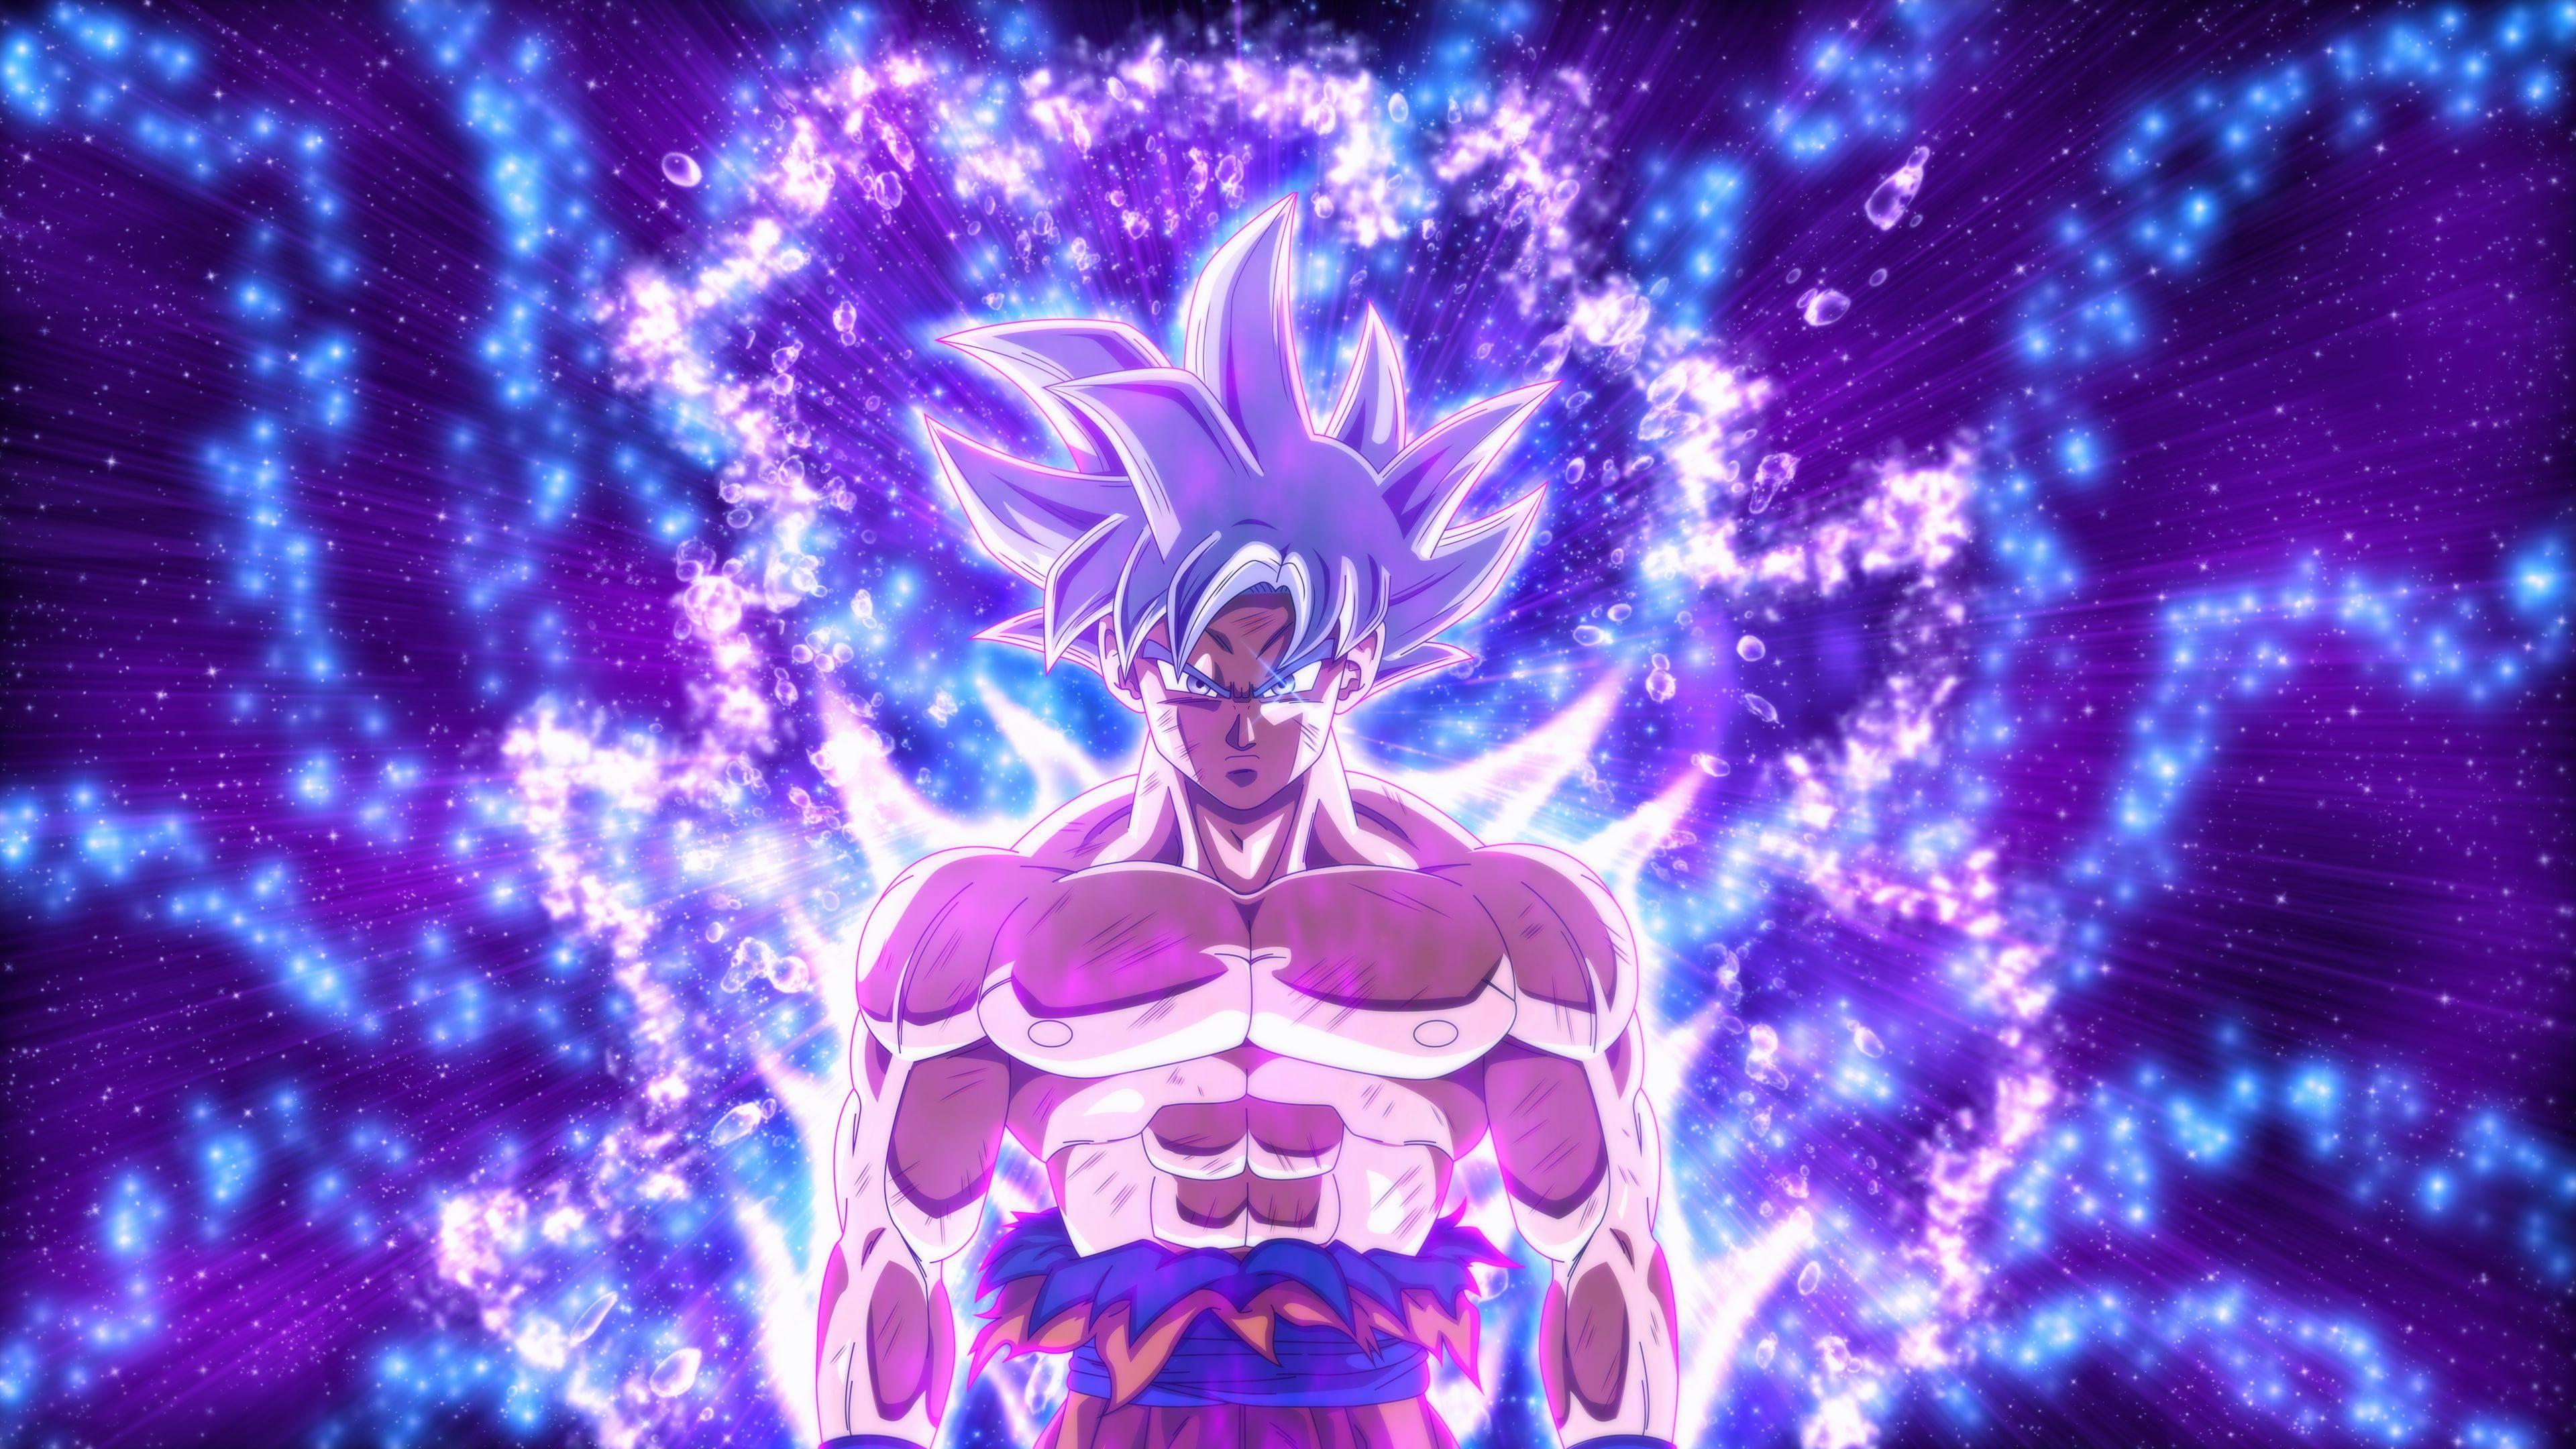 Dragon Ball Dragon Ball Super Anime Goku Ultra Instinct Dragon Ball 4k Wallpaper Hdw Goku Wallpaper Dragon Ball Wallpapers Goku Ultra Instinct Wallpaper